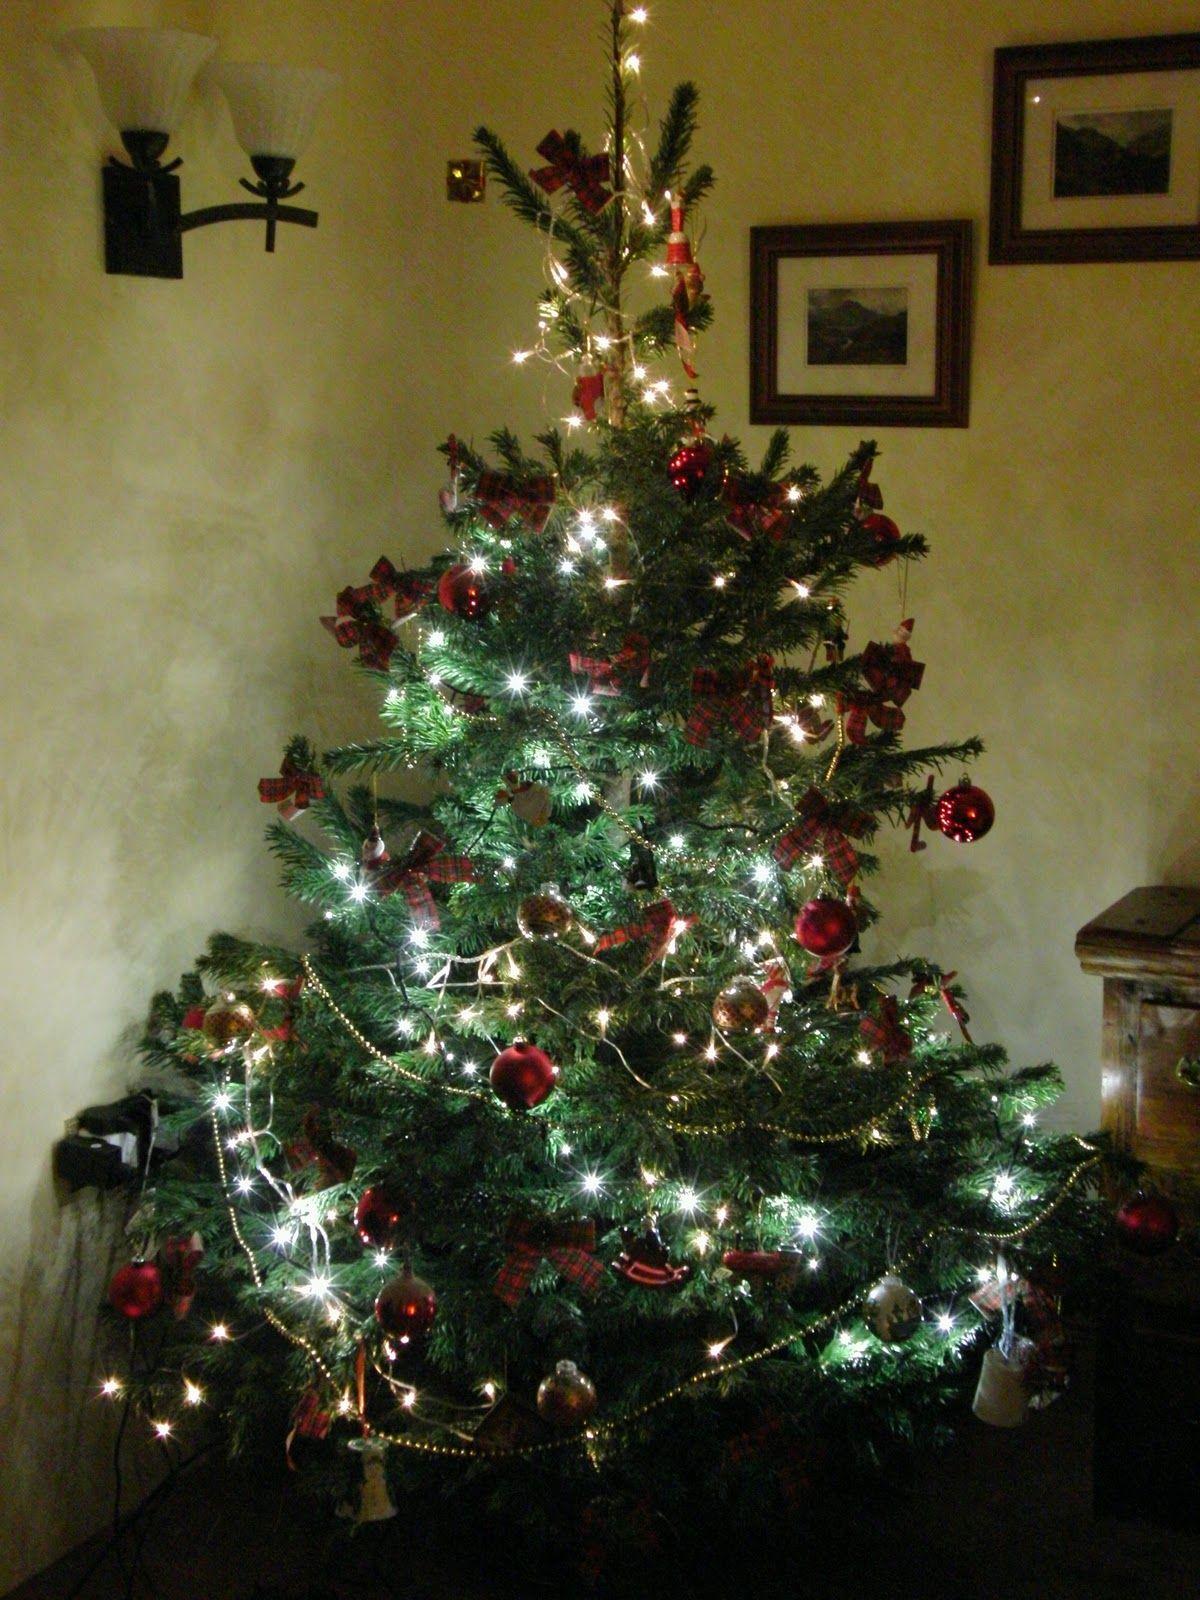 37 Fancy Christmas Tree Decorations Ideas | Christmas Decorations ...